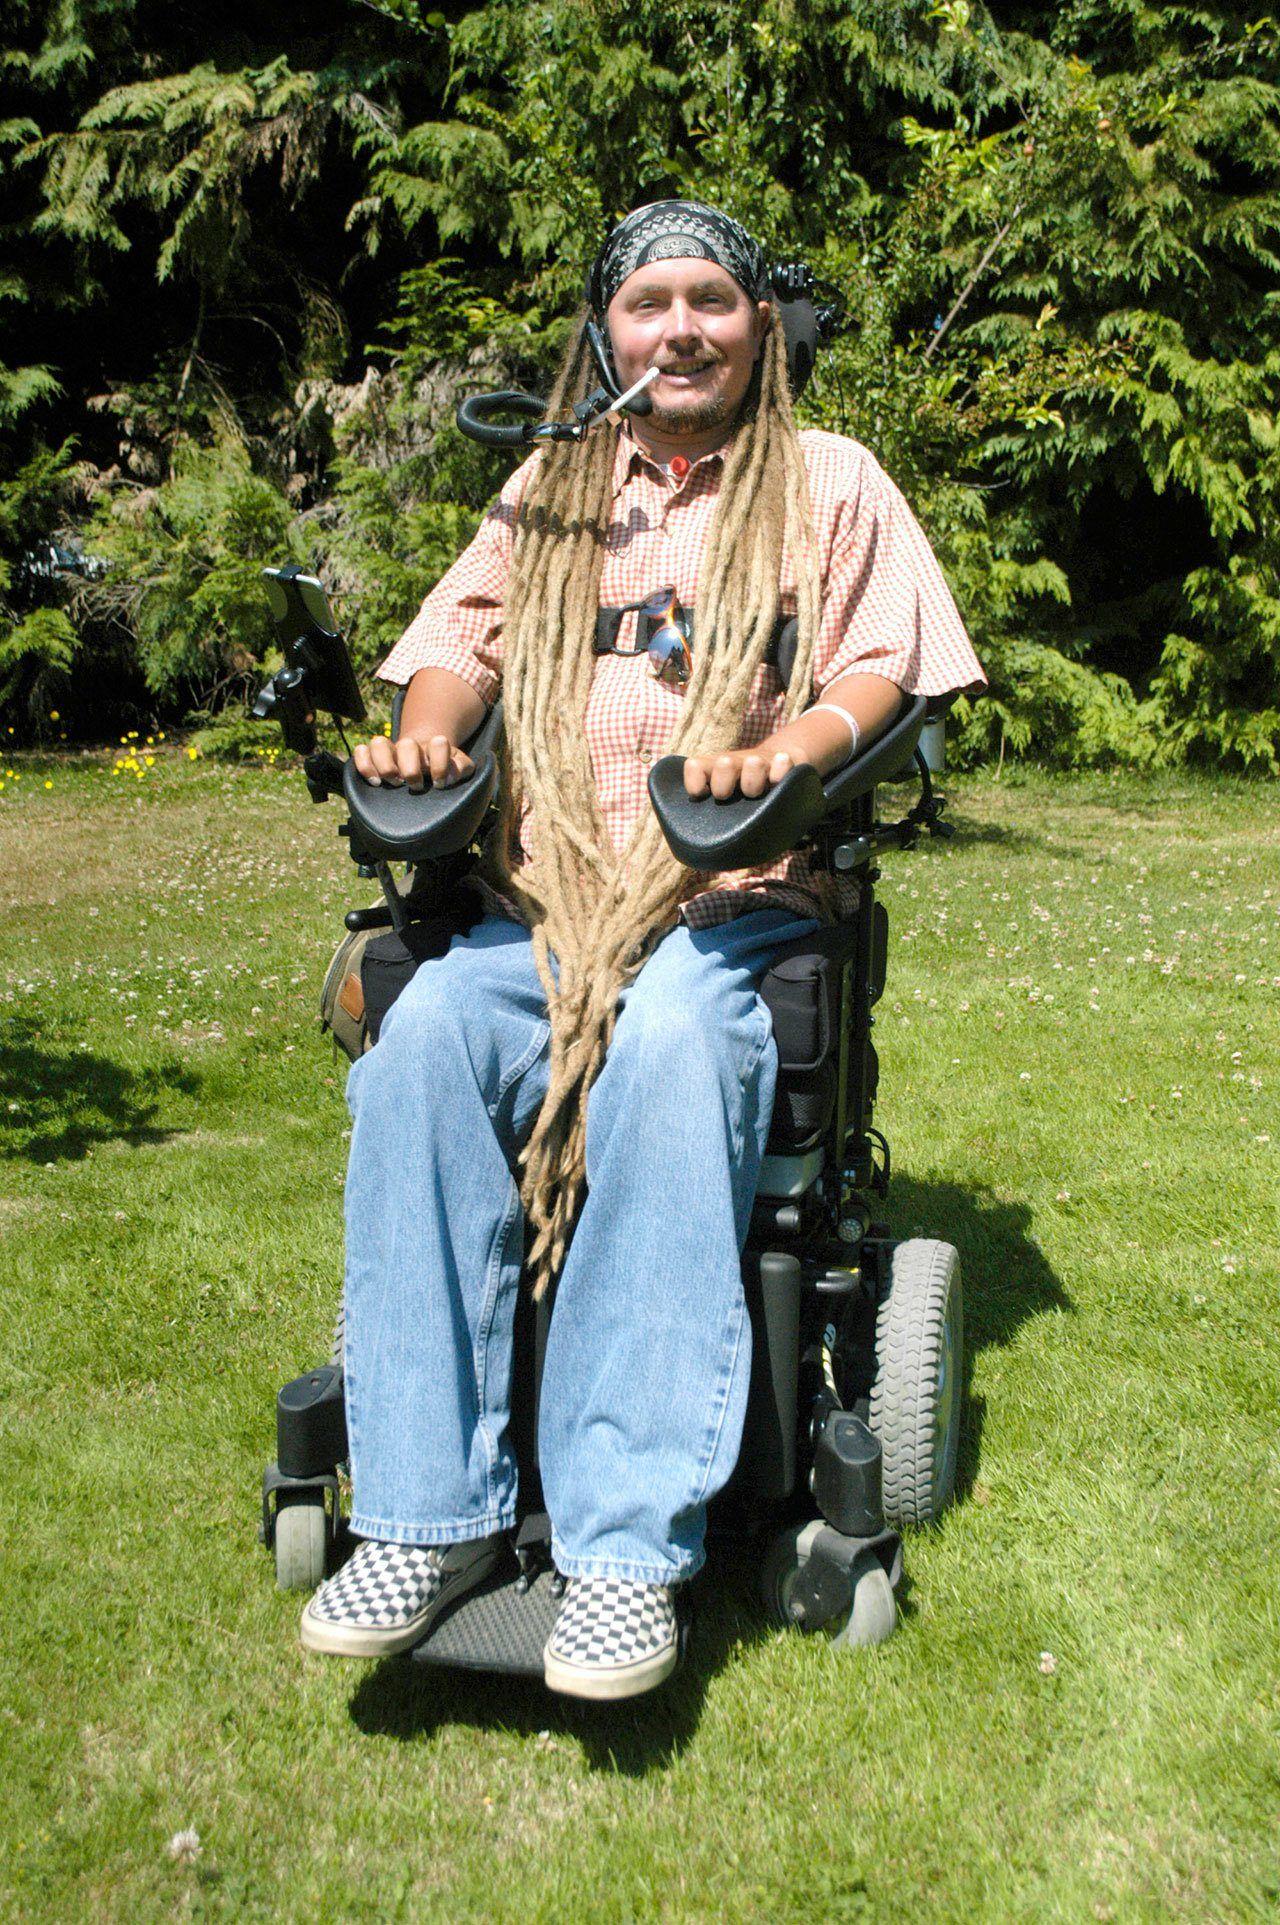 web1_160802_PDN_Wheelchair_Journey_web-640x963@2x.jpg